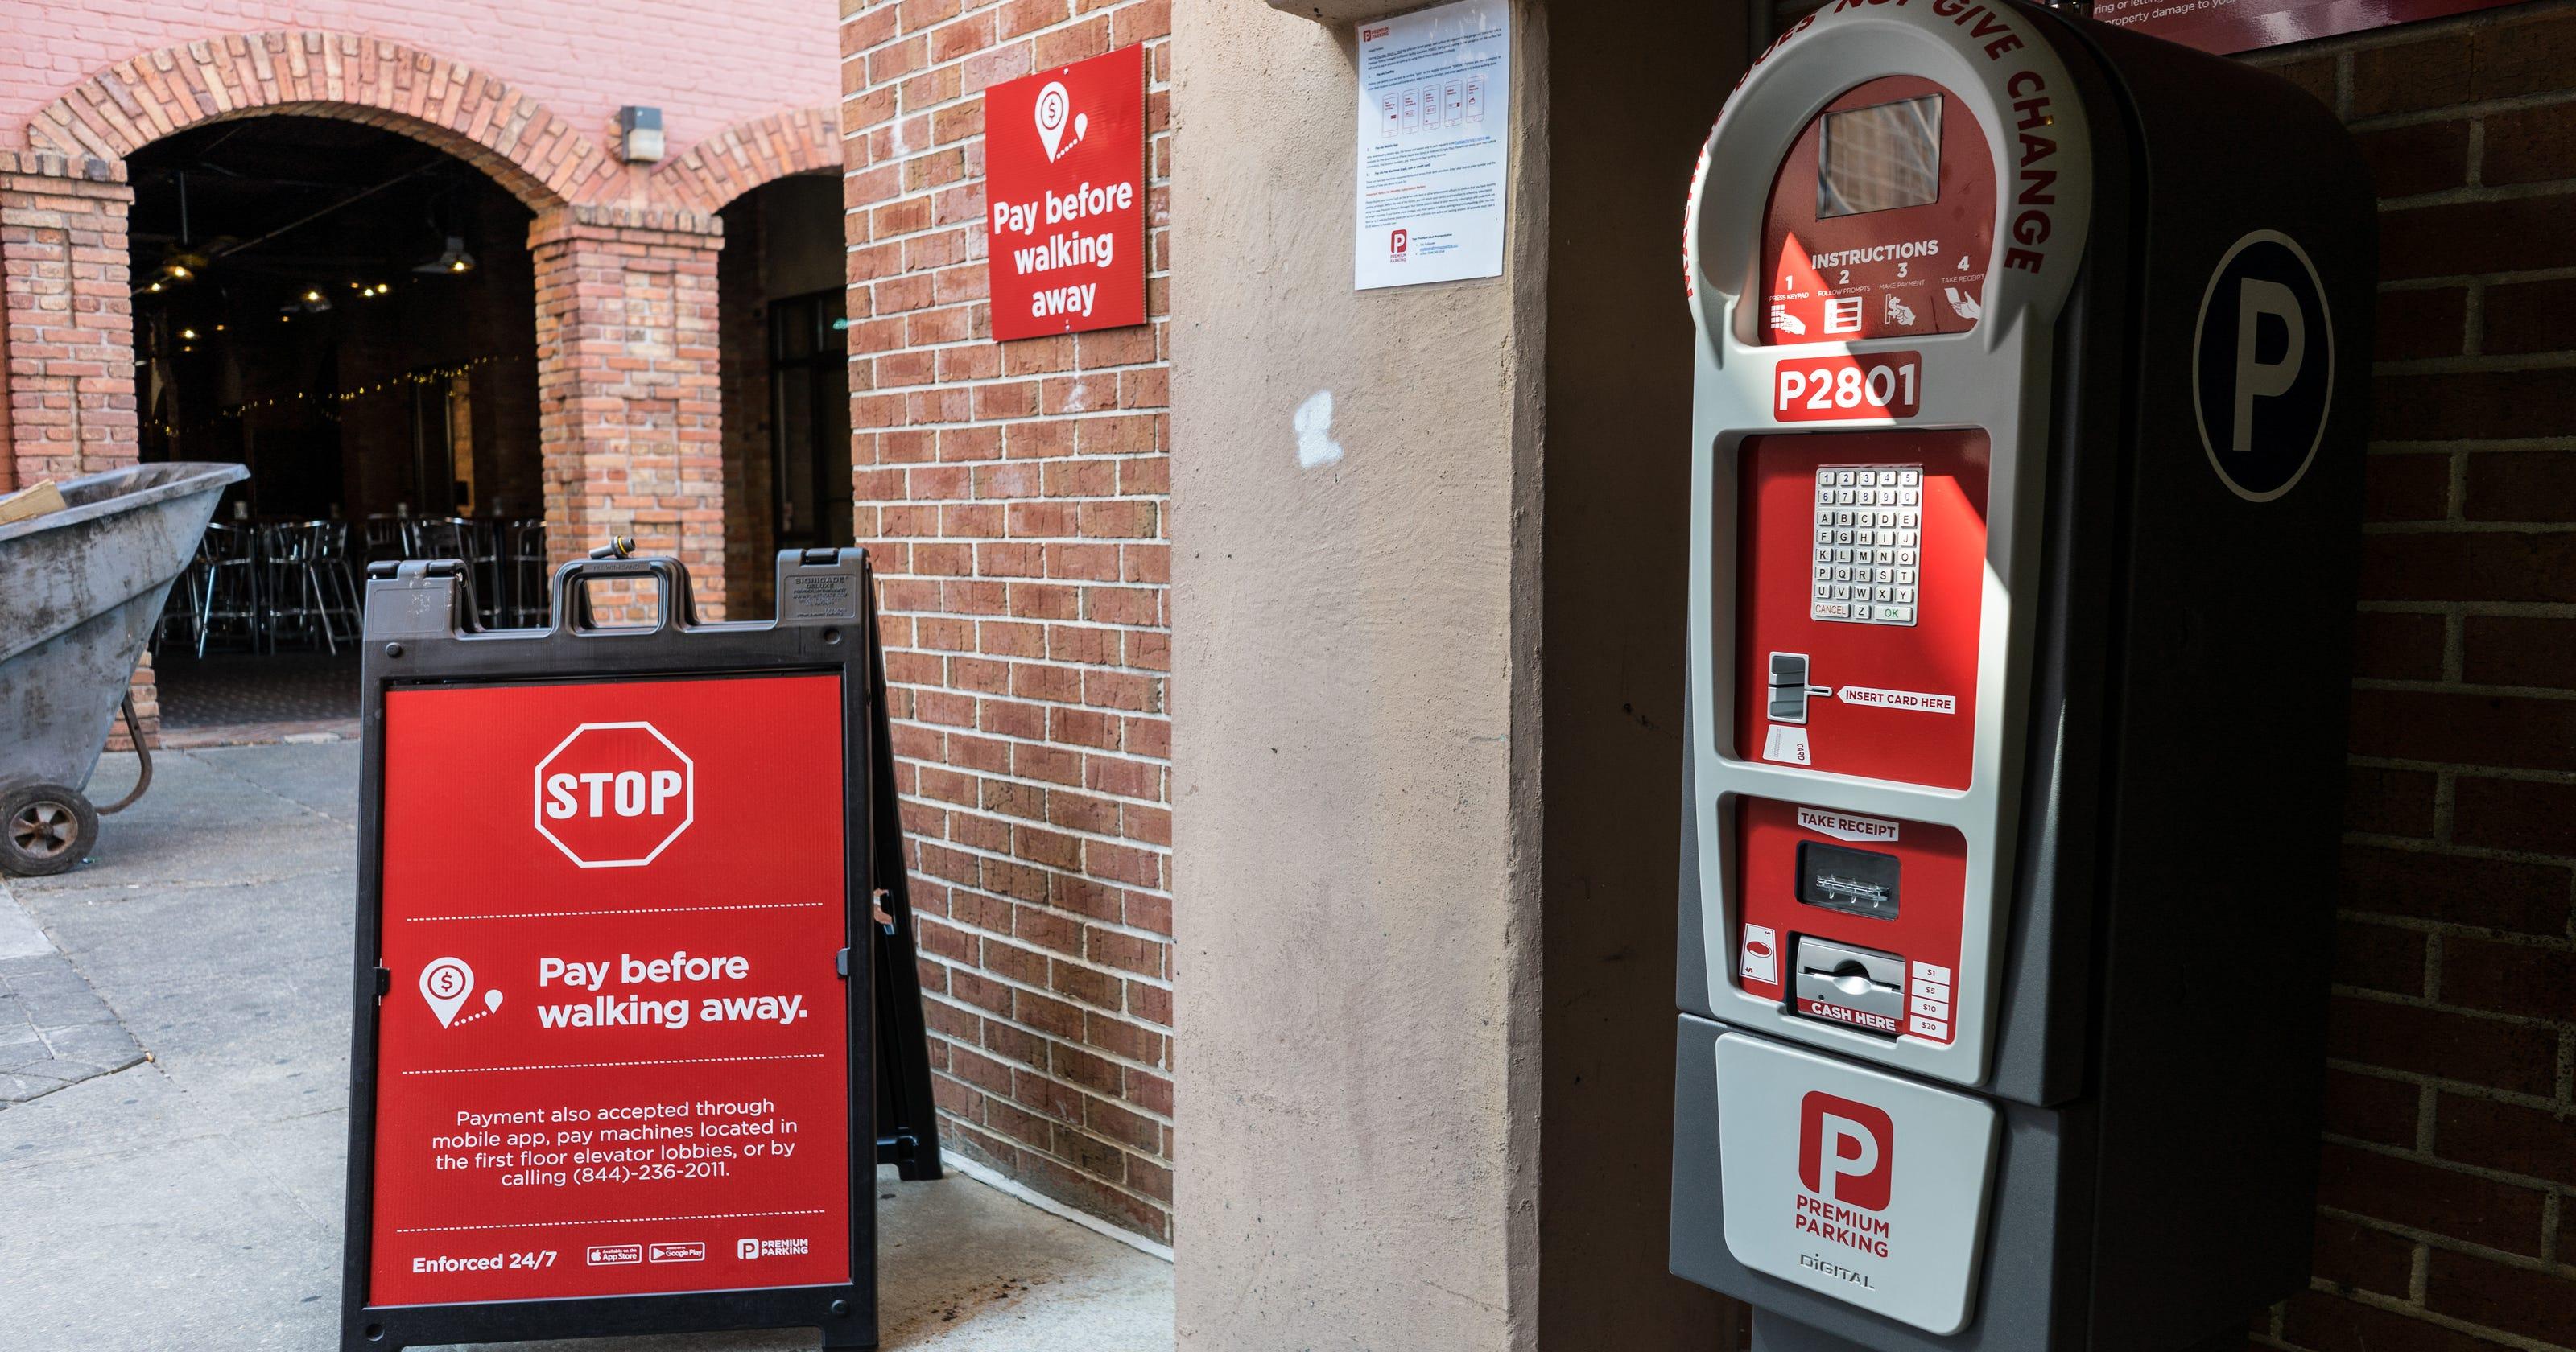 Pensacola DIB gives Premium Parking 30 days to address